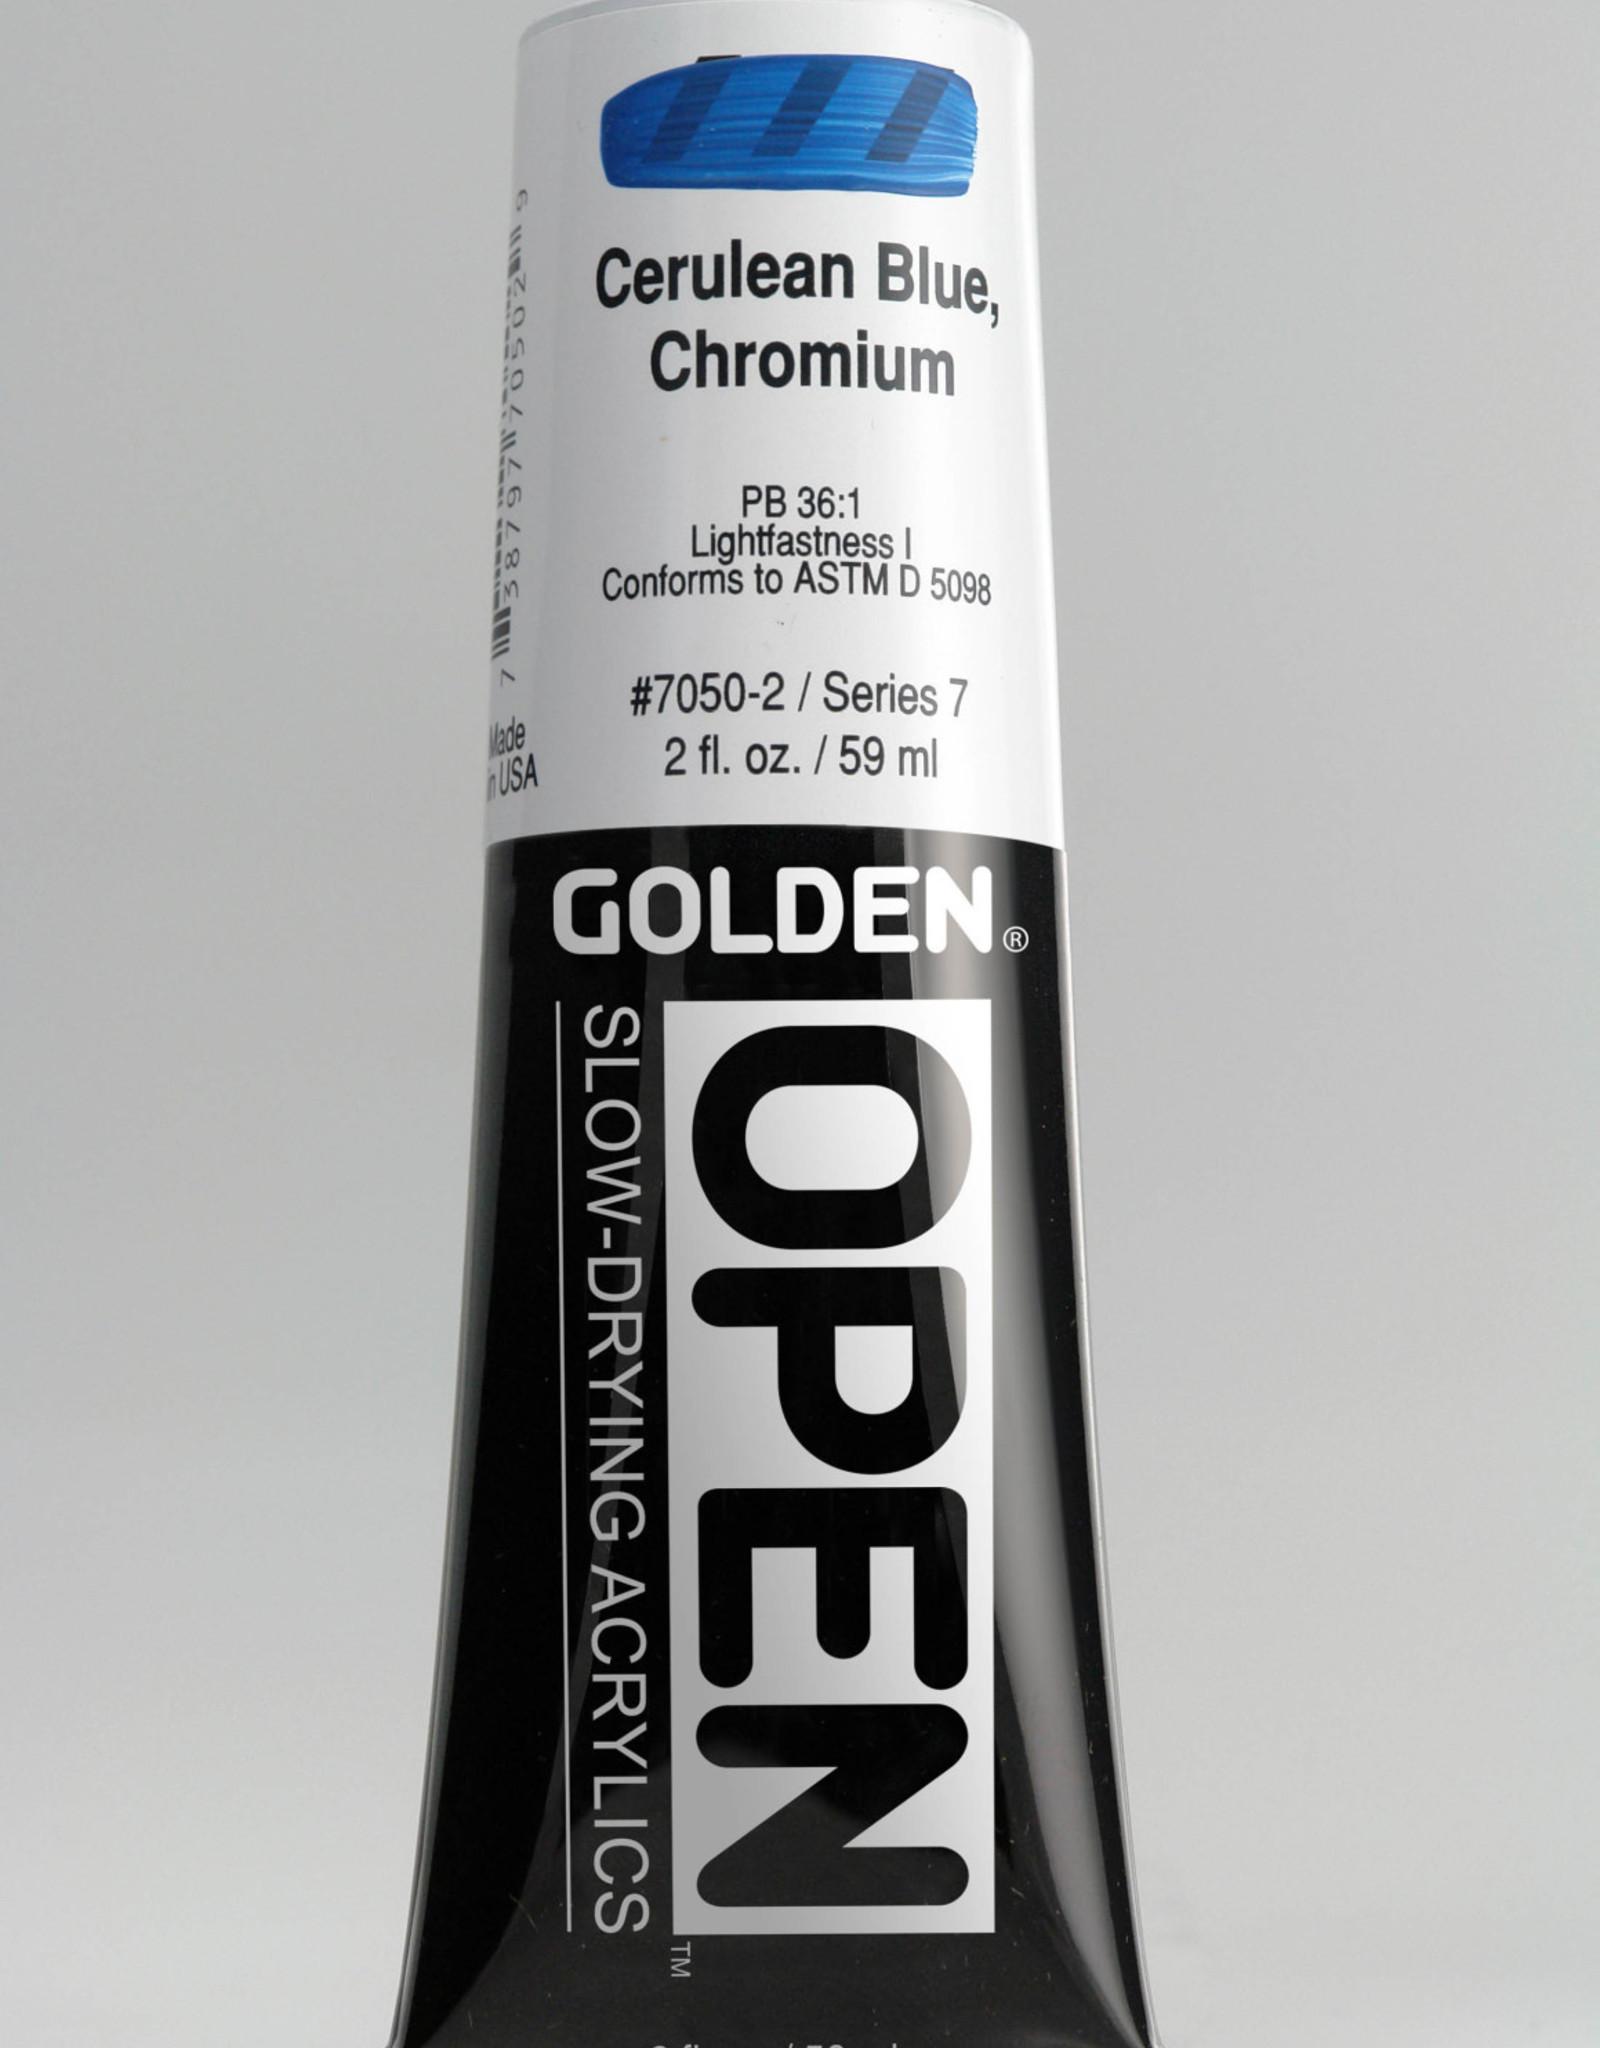 Golden OPEN, Acrylic Paint, Cerulean Blue Chromium, Series 7, Tube (2fl.oz.)